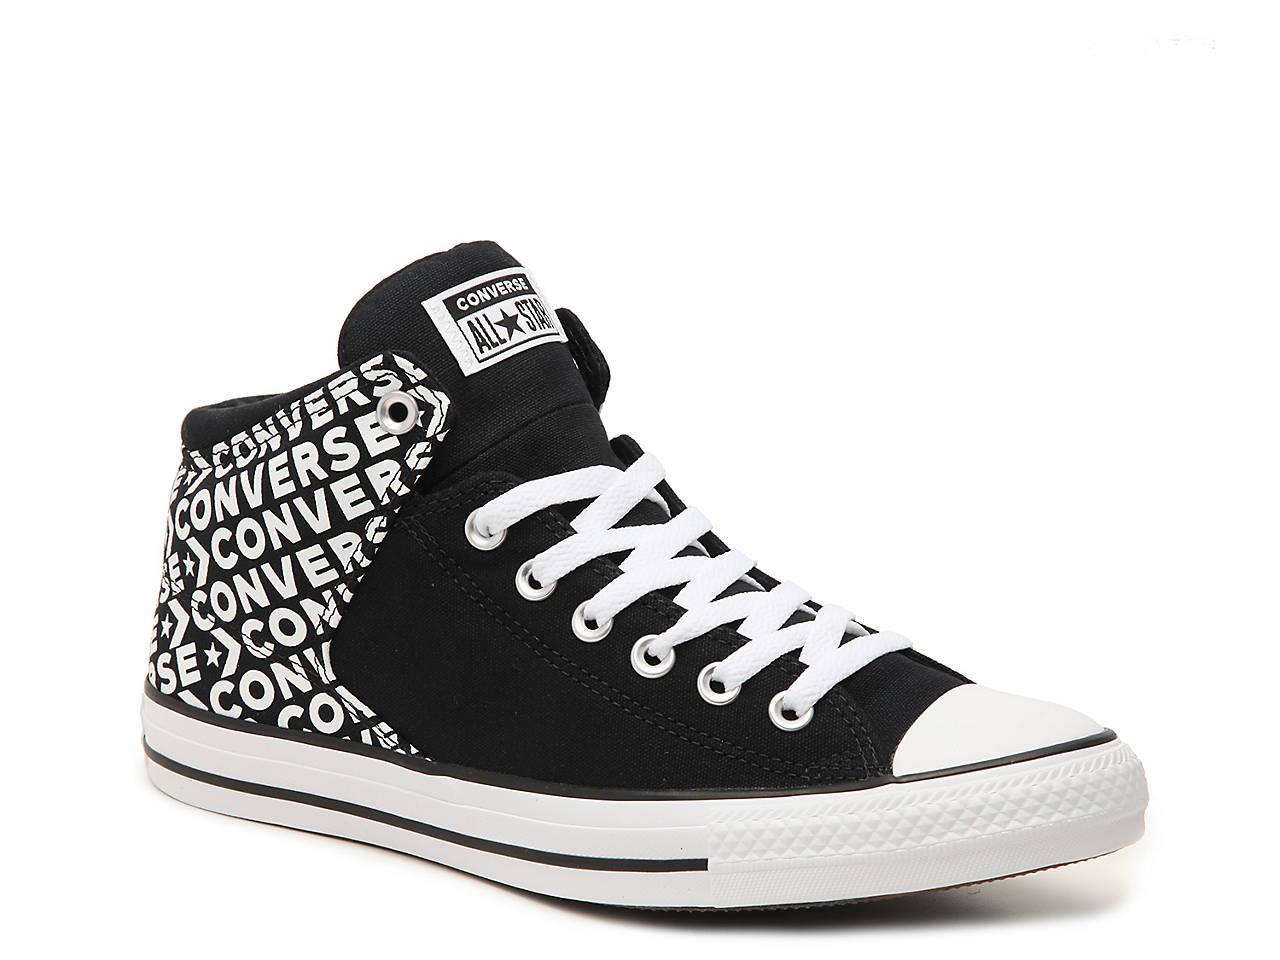 c7afa652cd861f Converse Chuck Taylor All Star Hi Street Word High-Top Sneaker - Women s  Women s Shoes